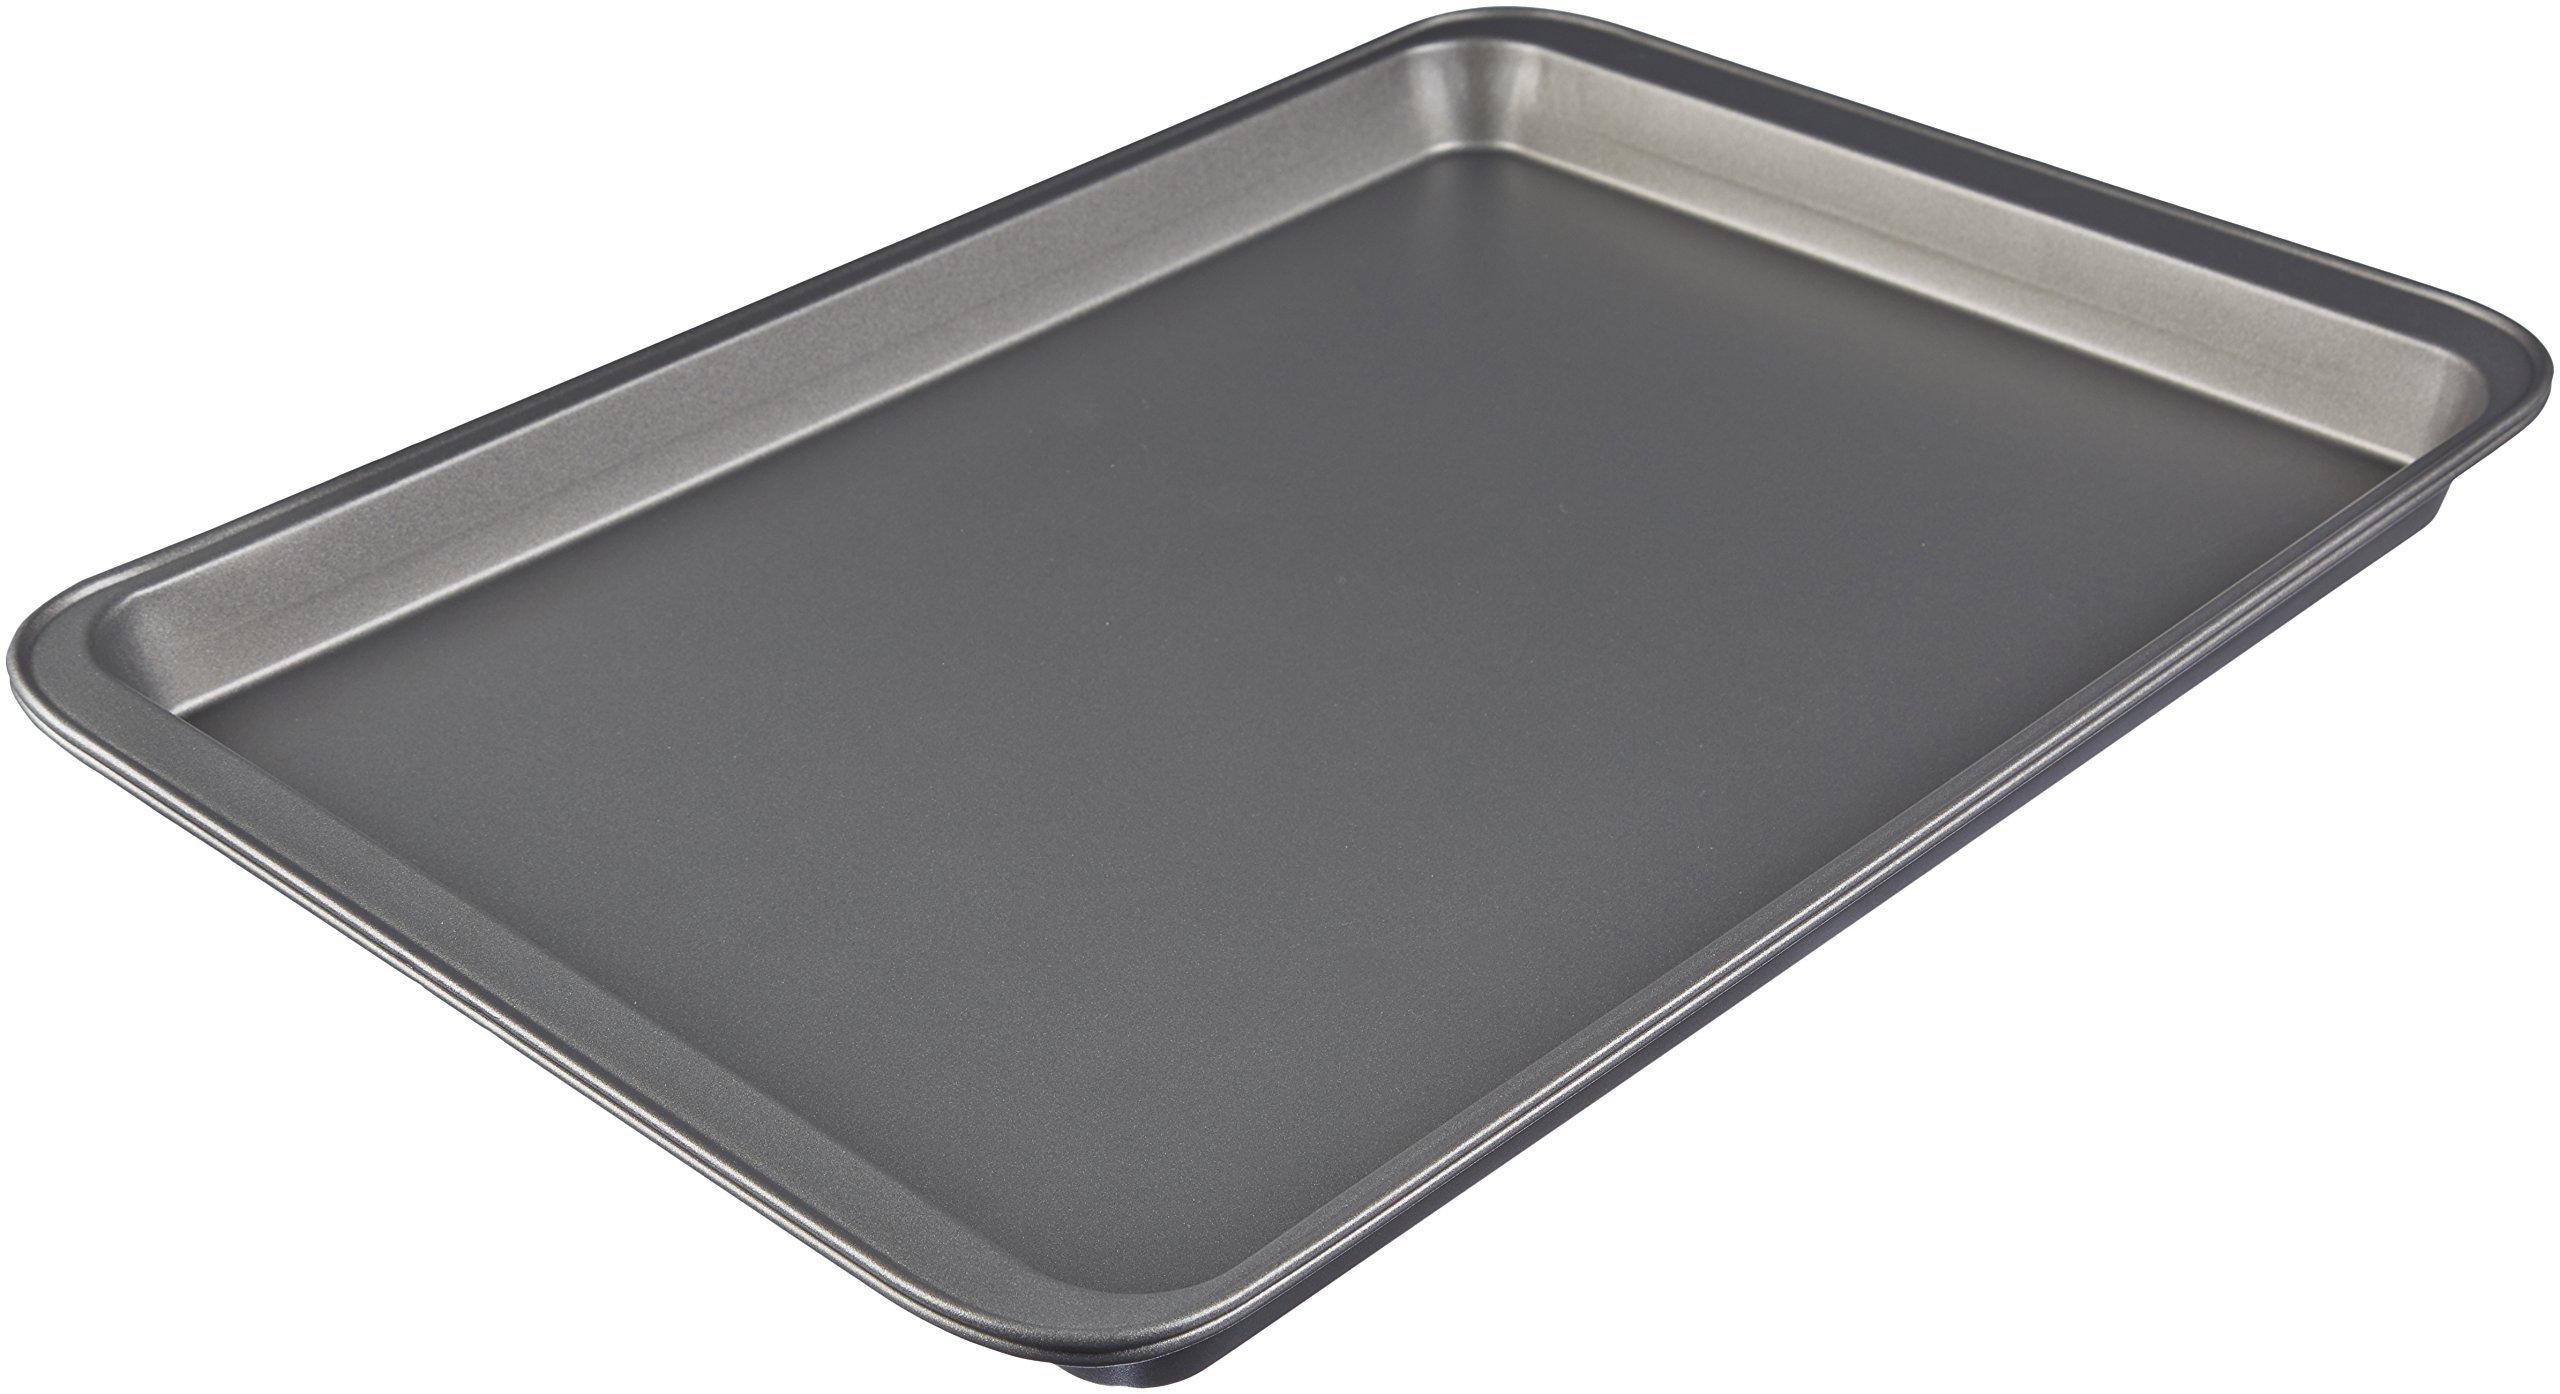 AmazonBasics Nonstick Carbon Steel Half Baking Sheet - 2-Pack by AmazonBasics (Image #3)